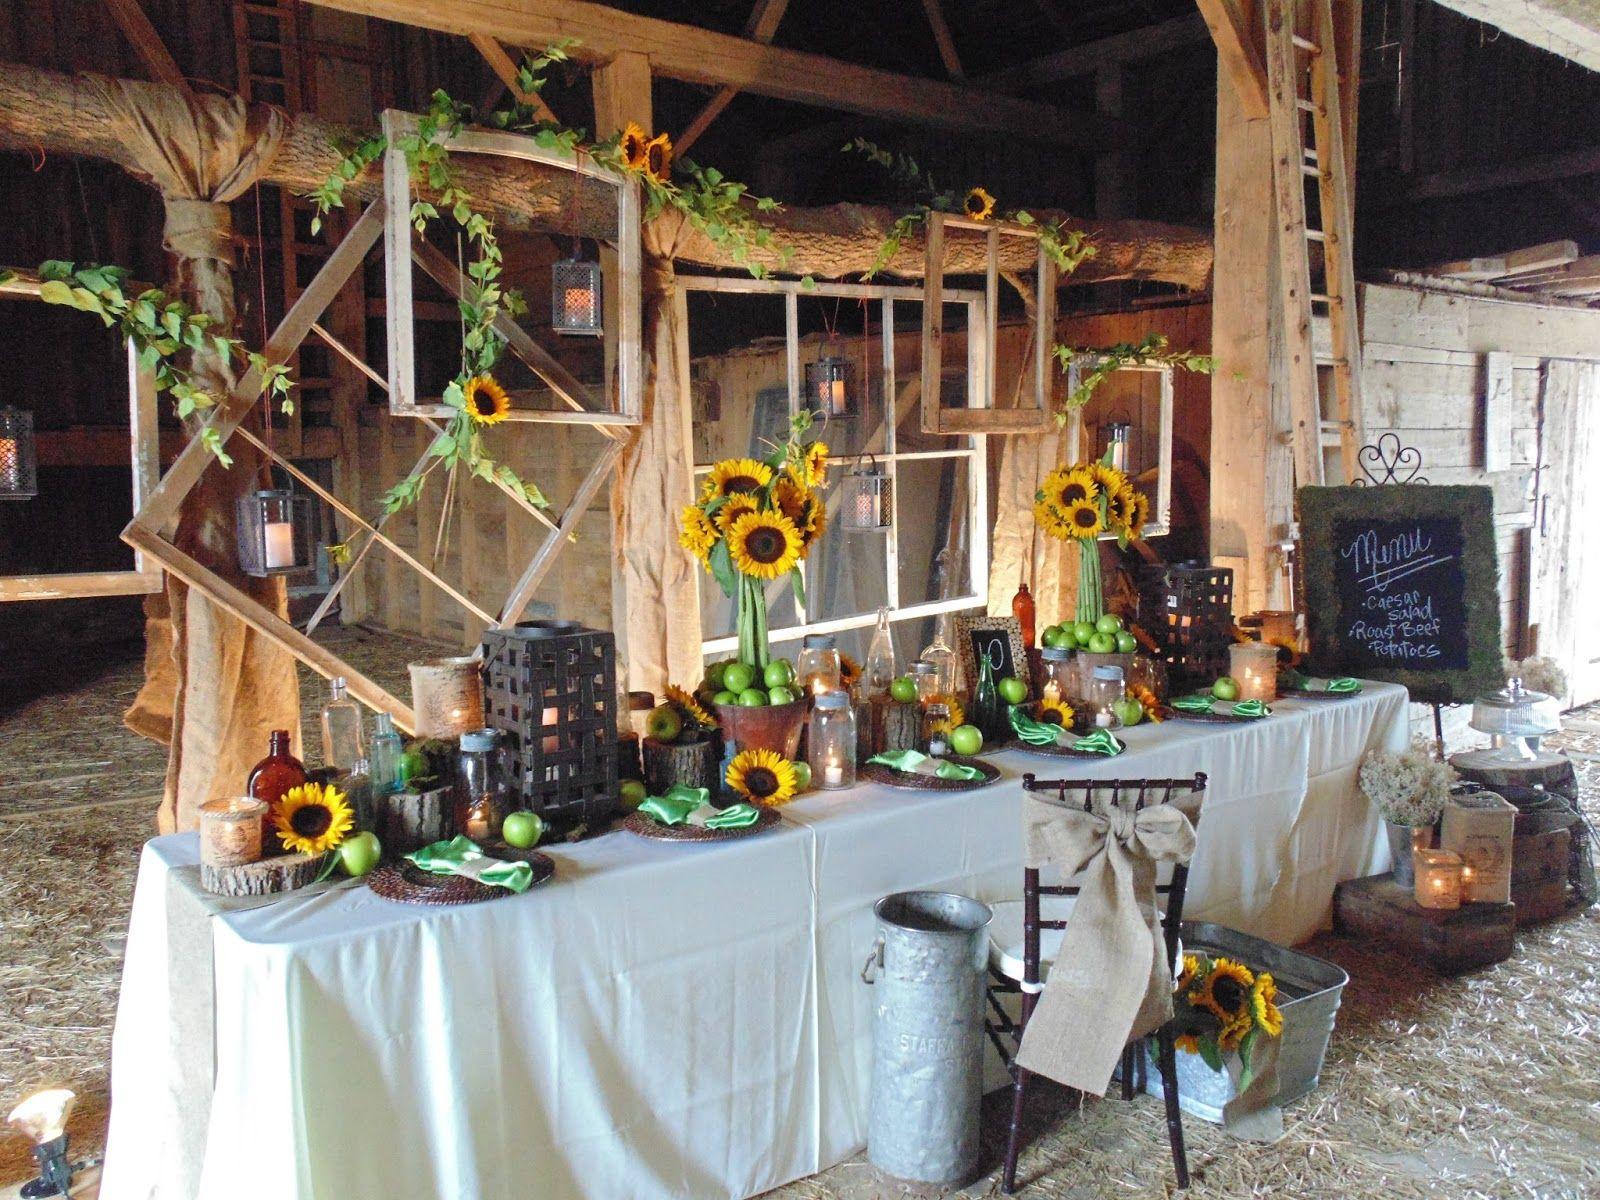 40 DIY Barn Wedding Ideas For A CountryFlavored